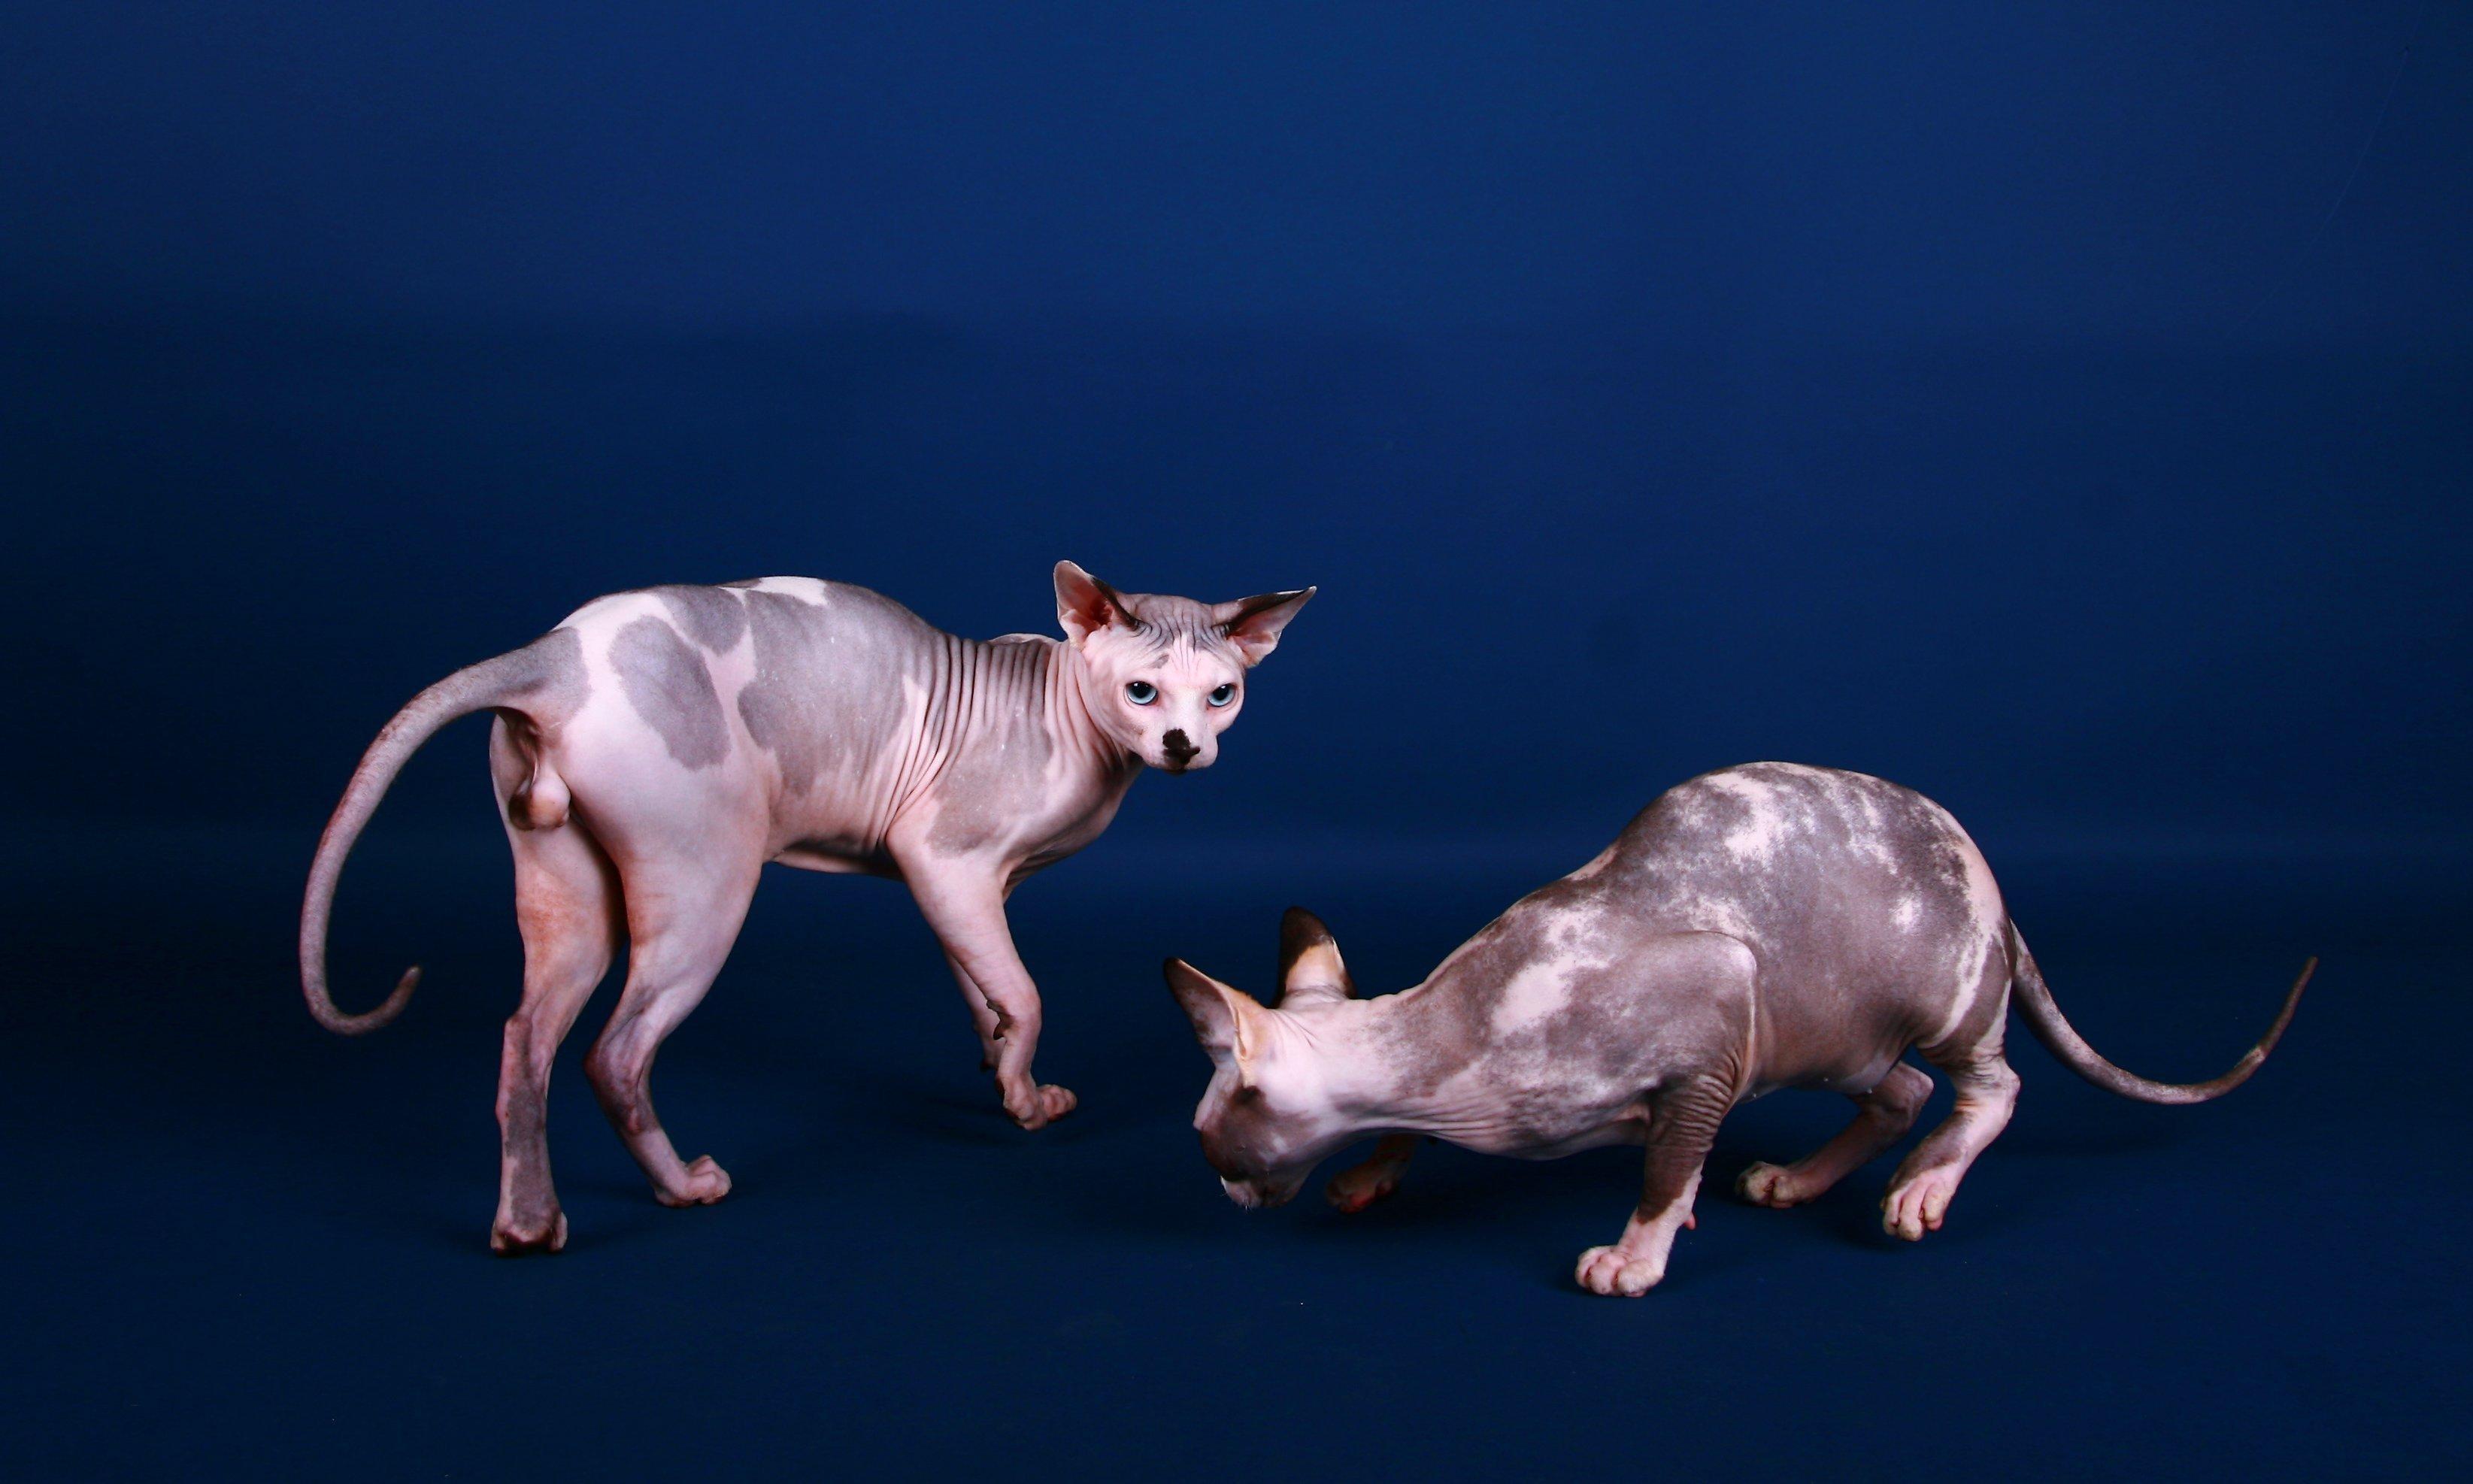 Sphynx cat wallpapers hd